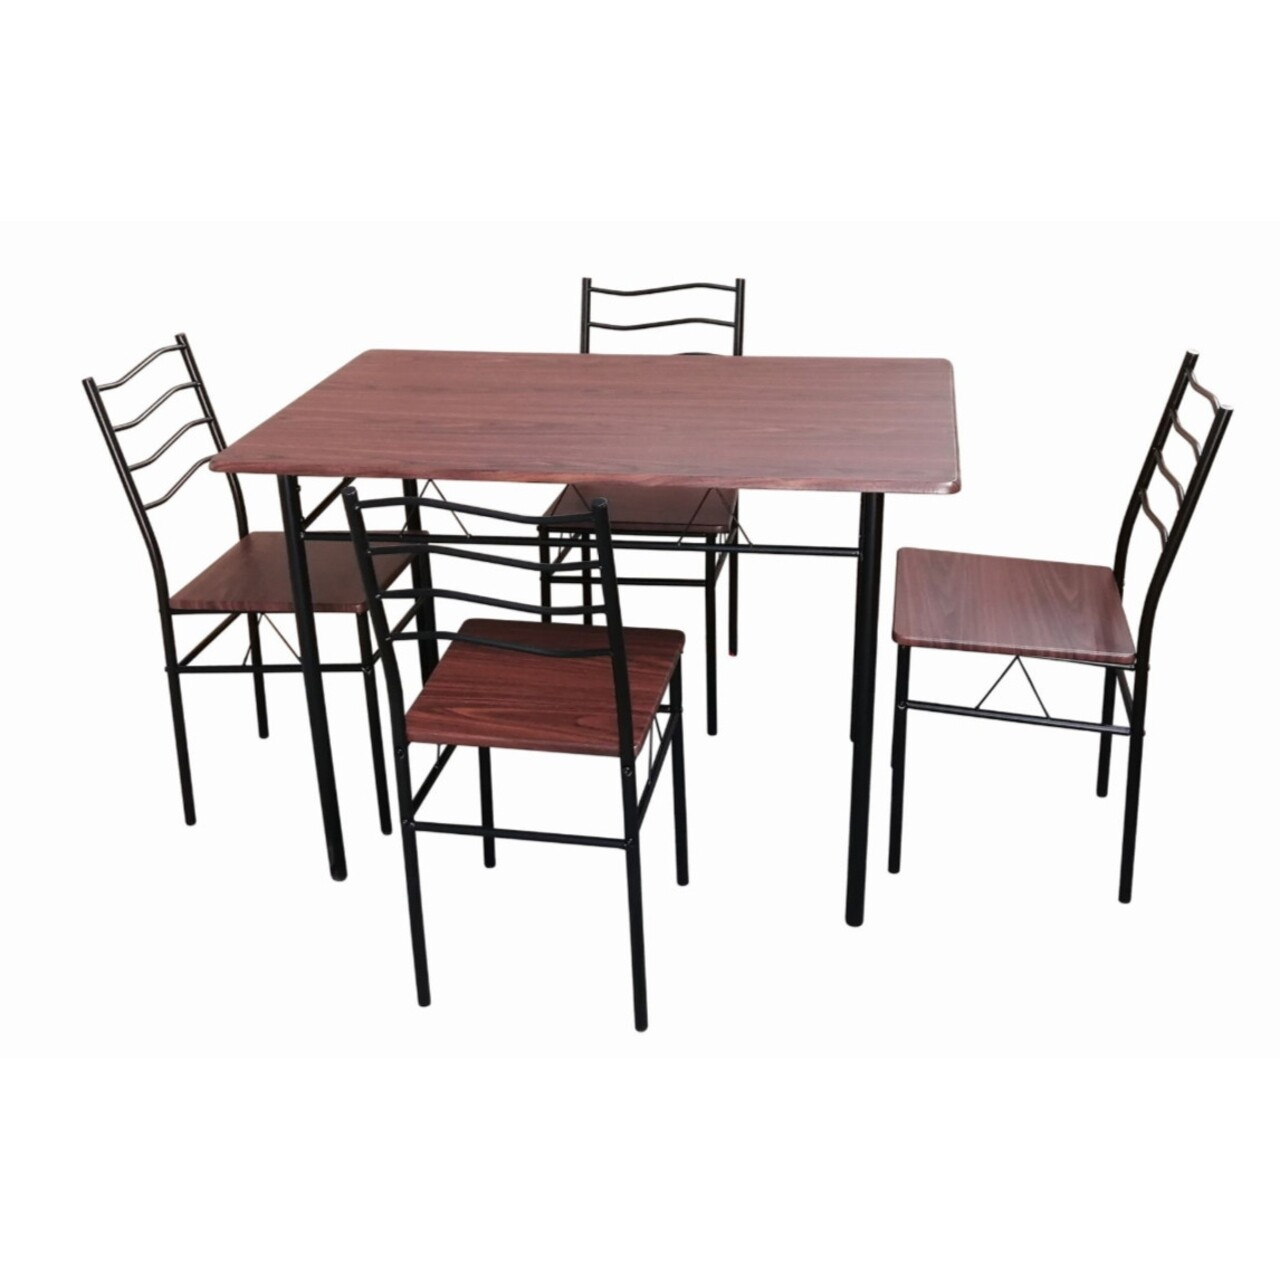 Set dining Bedora Mang, masa cu 4 scaune, Nuanta Cires